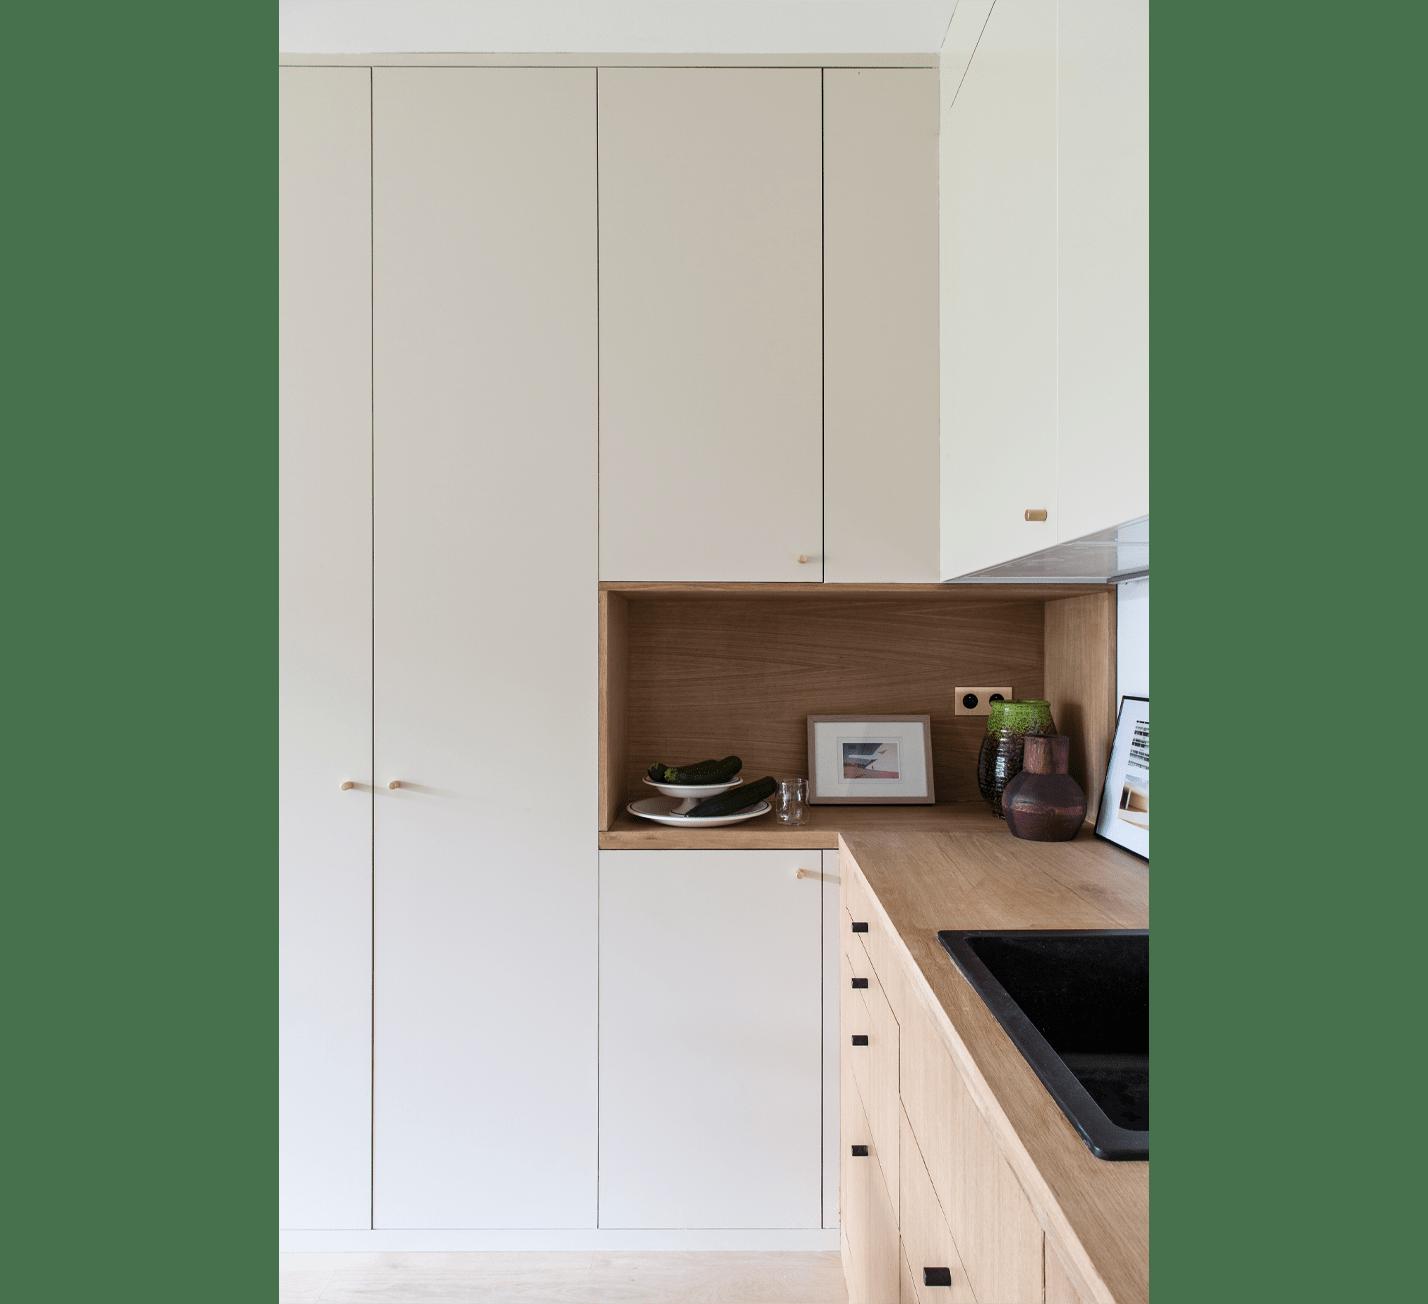 Projet-Albert-Atelier-Steve-Pauline-Borgia-Architecte-interieur-04-min-1